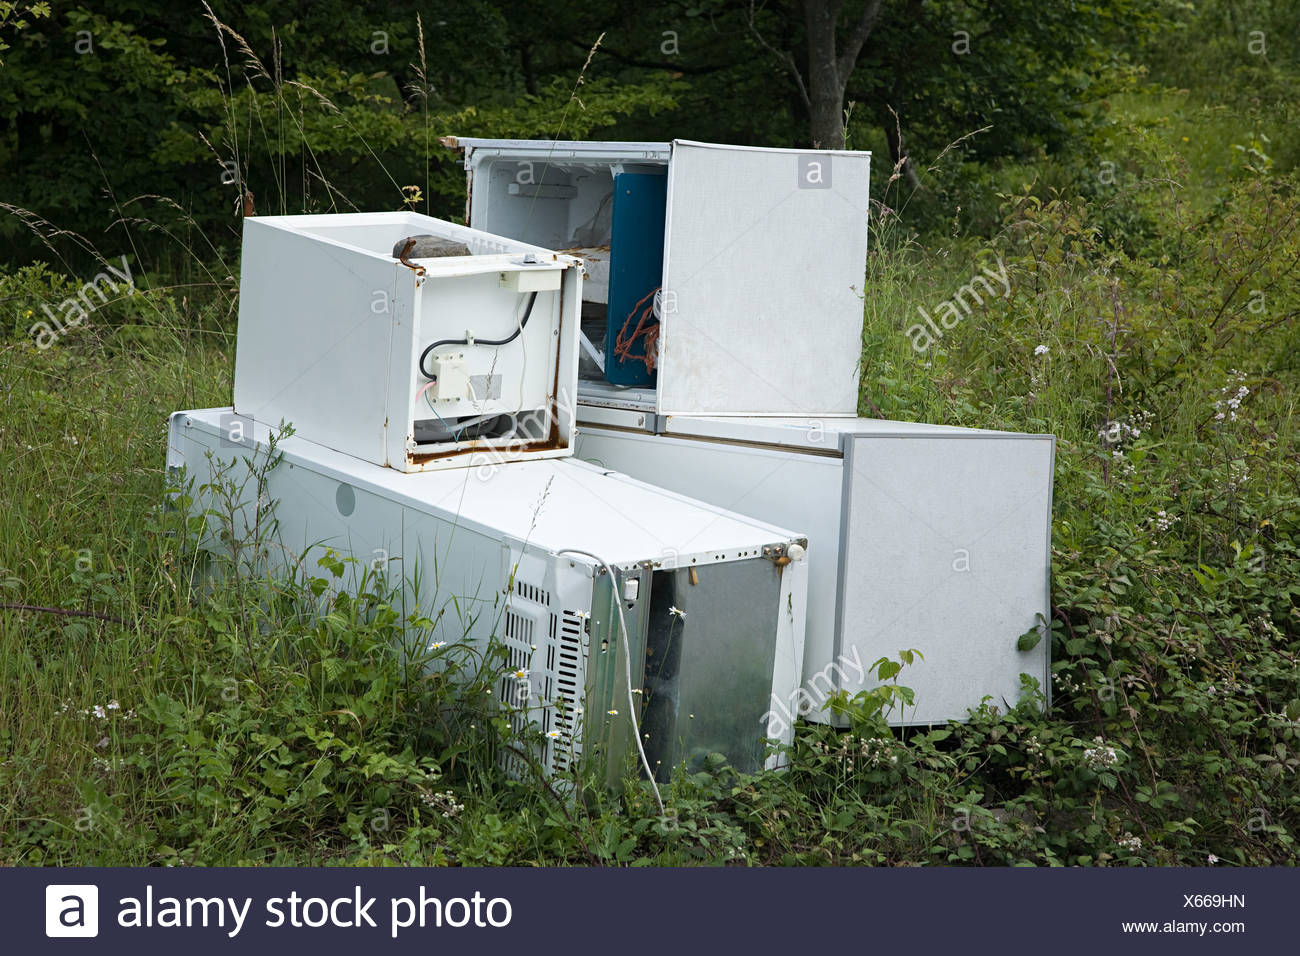 Discarded refridgerator - Stock Image